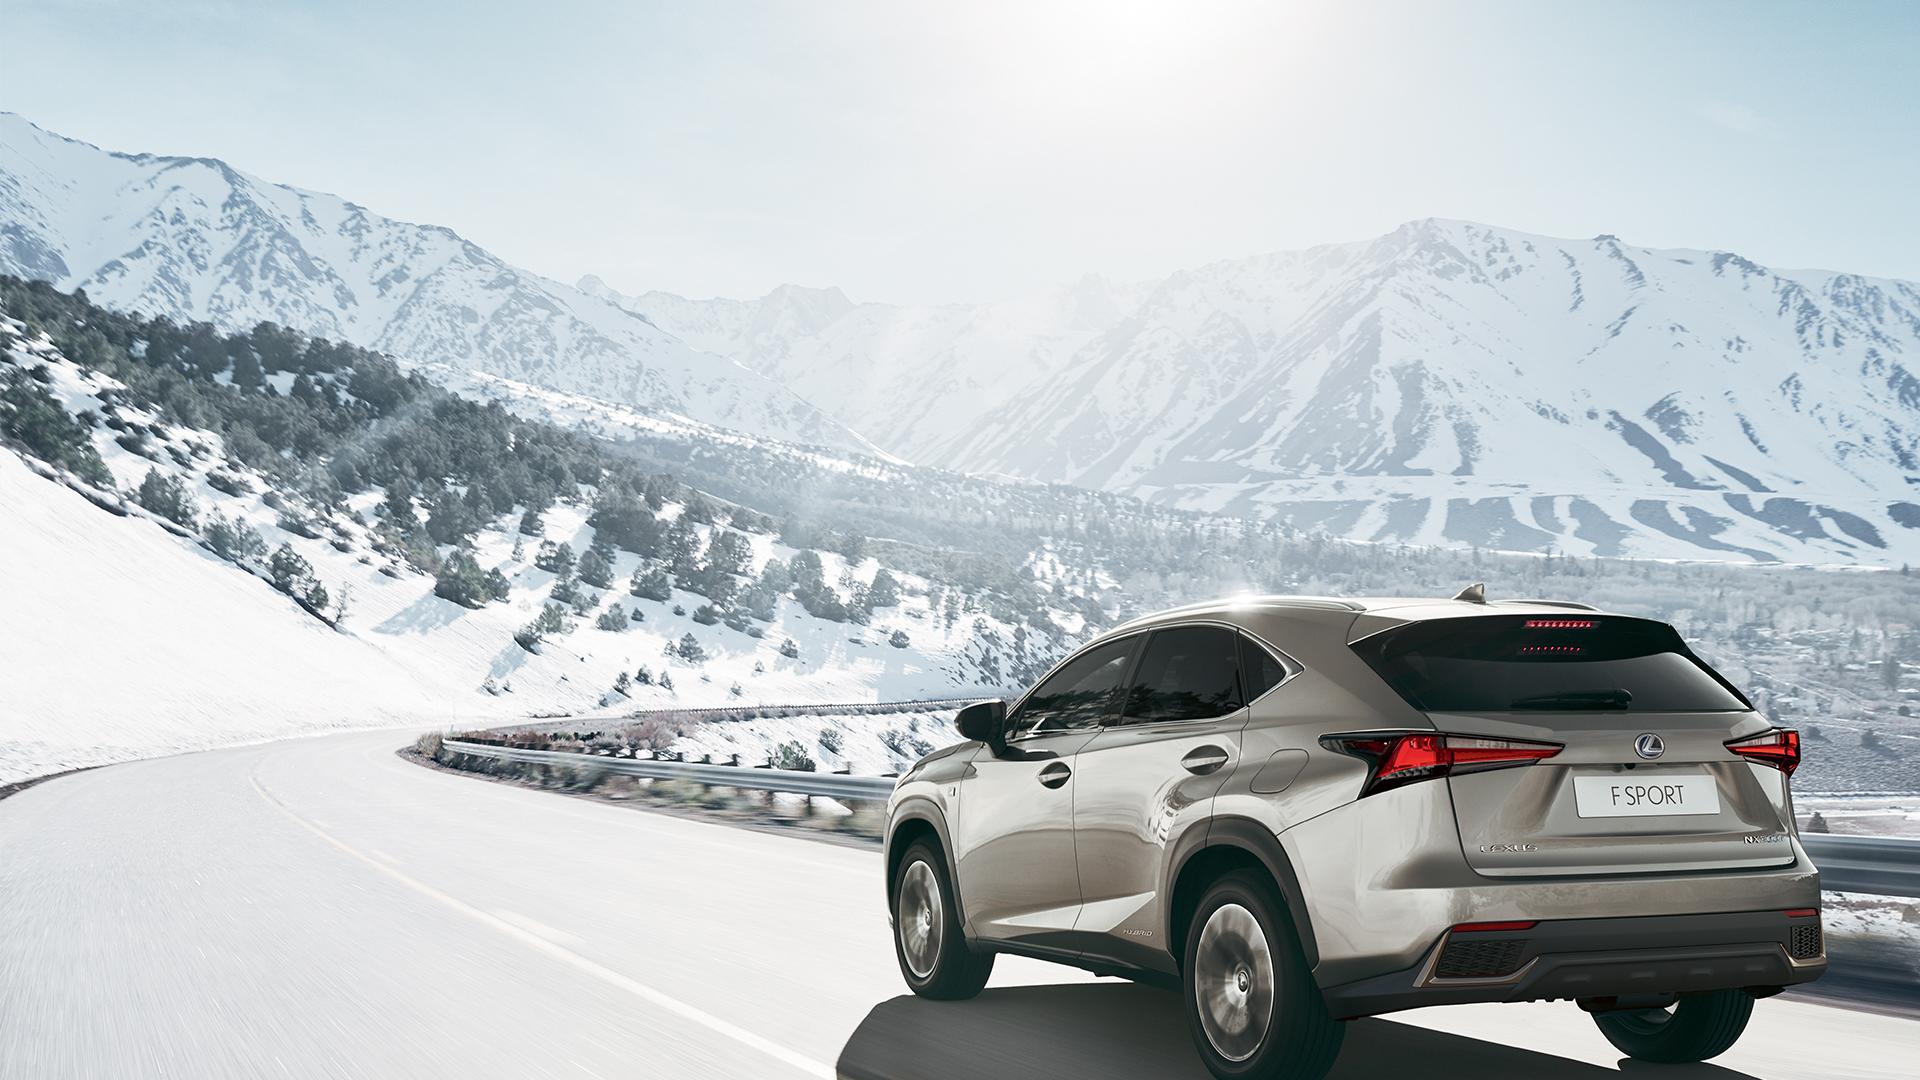 Lexus Roues Hiver image